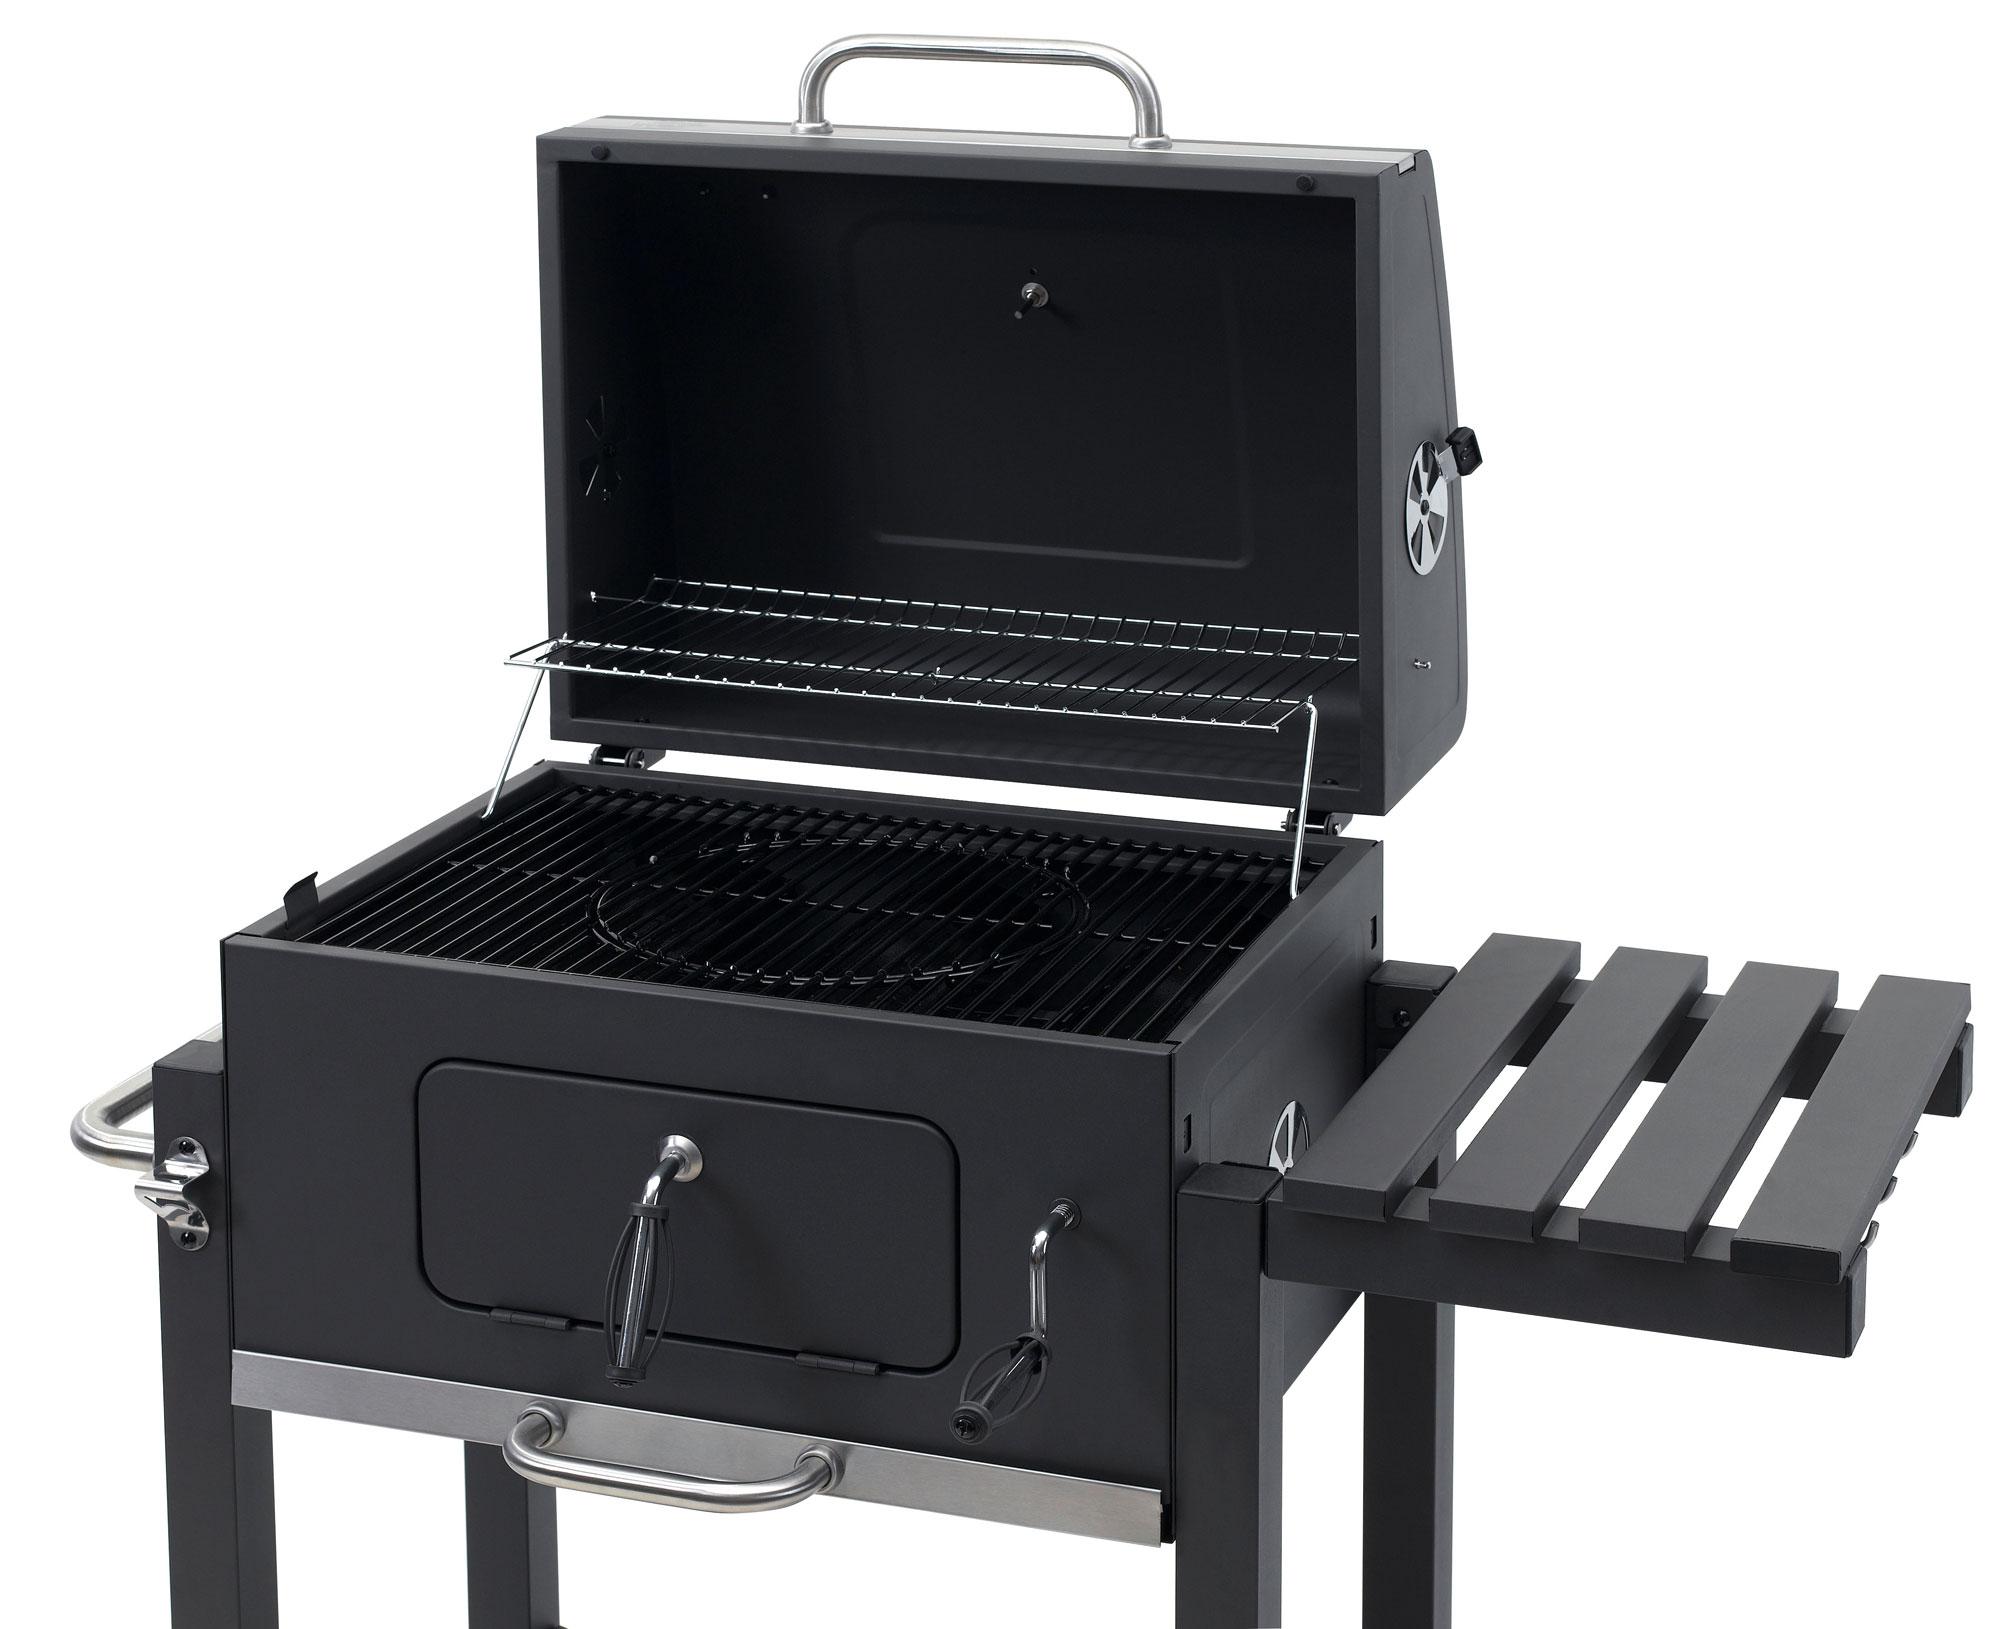 Tepro Holzkohlegrill Toronto Click Abdeckhaube : Tepro holzkohlegrill grillwagen toronto click grillfläche